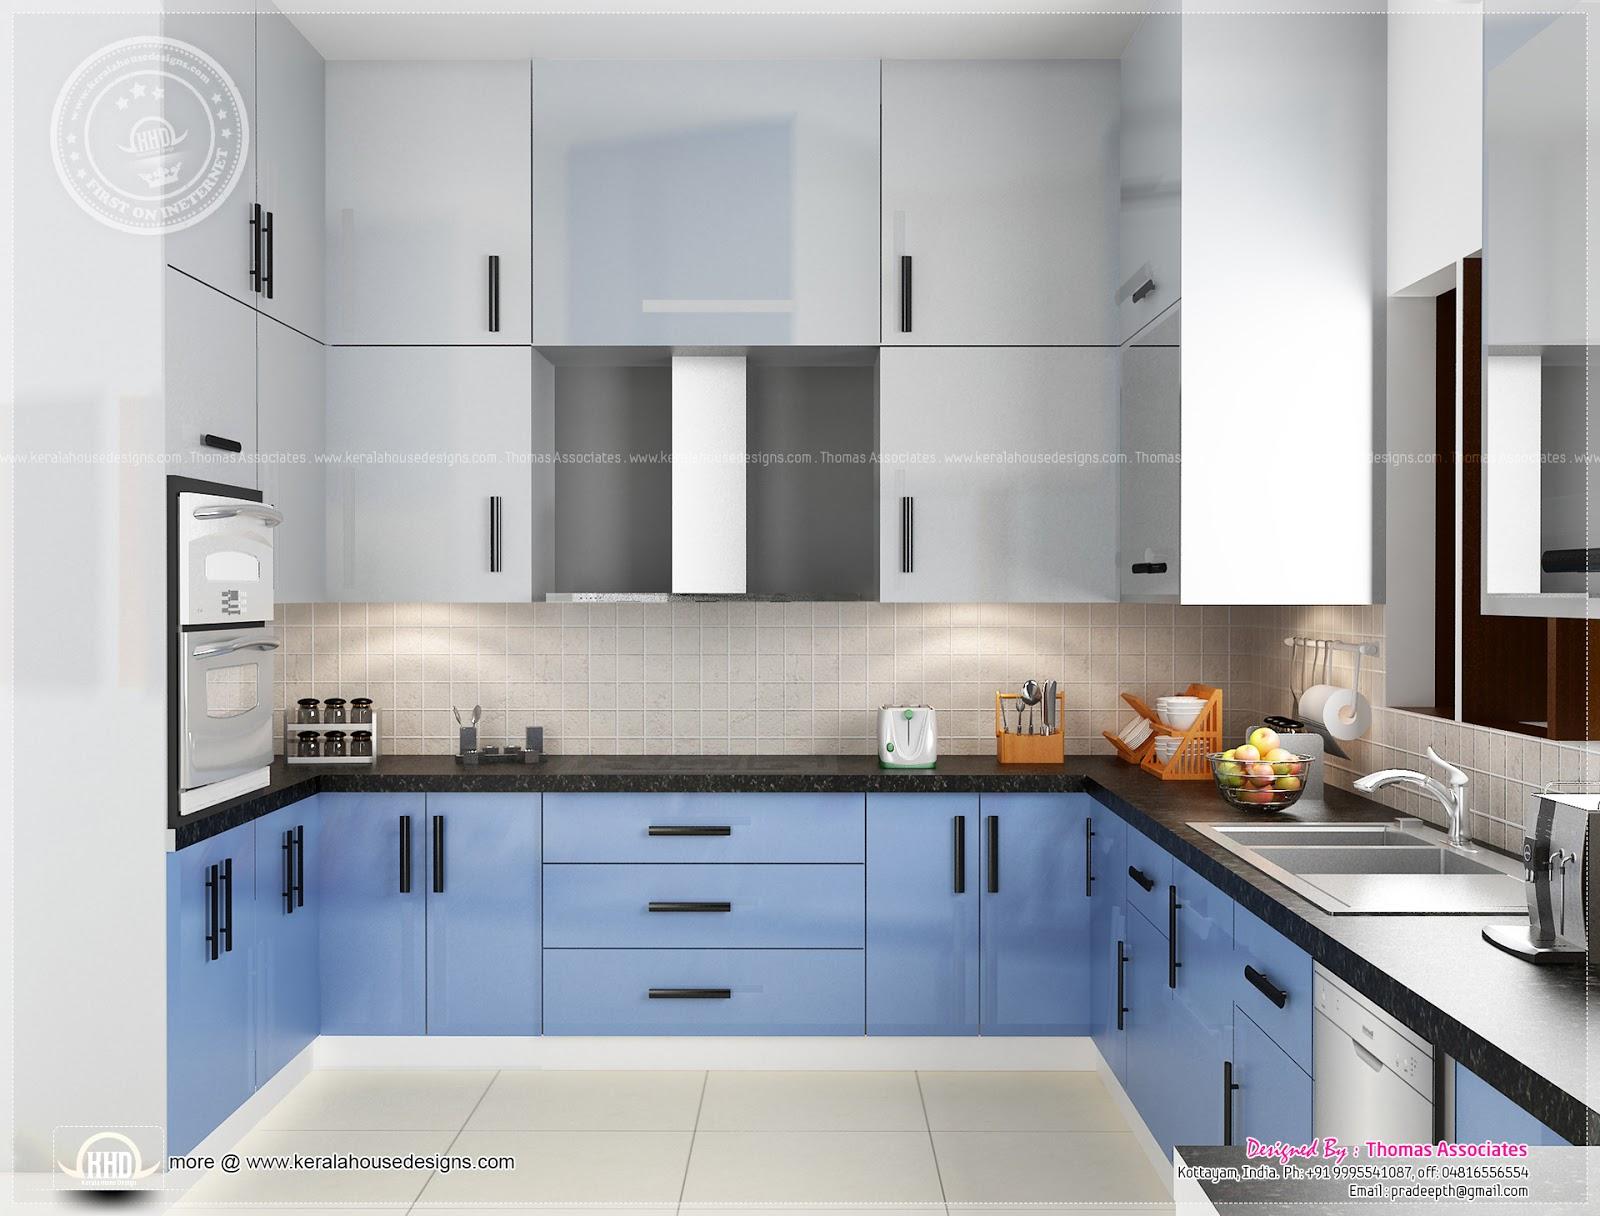 indian kitchen interior design photos - feed kitchens